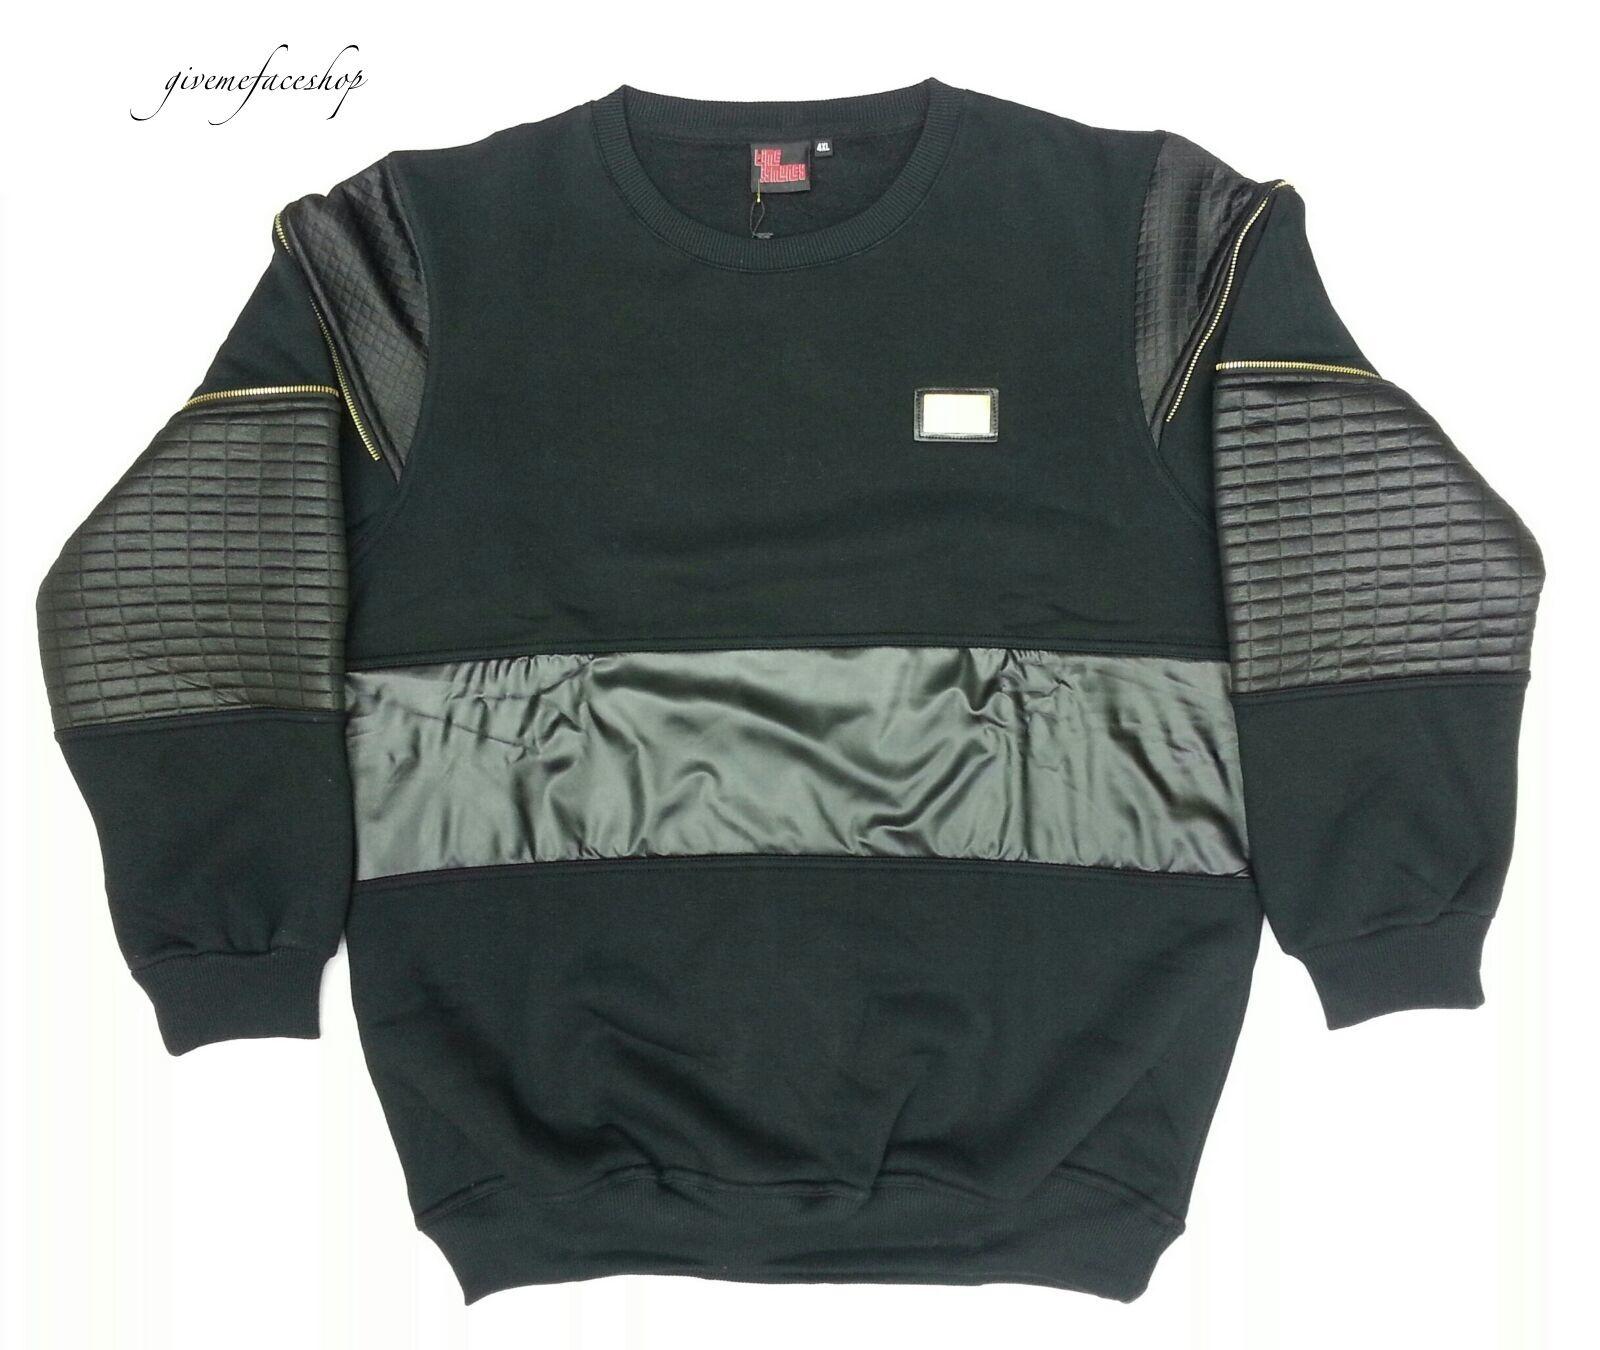 Time is Money mens G faux Leder sweatshirt club-star print jumper hip hop bl